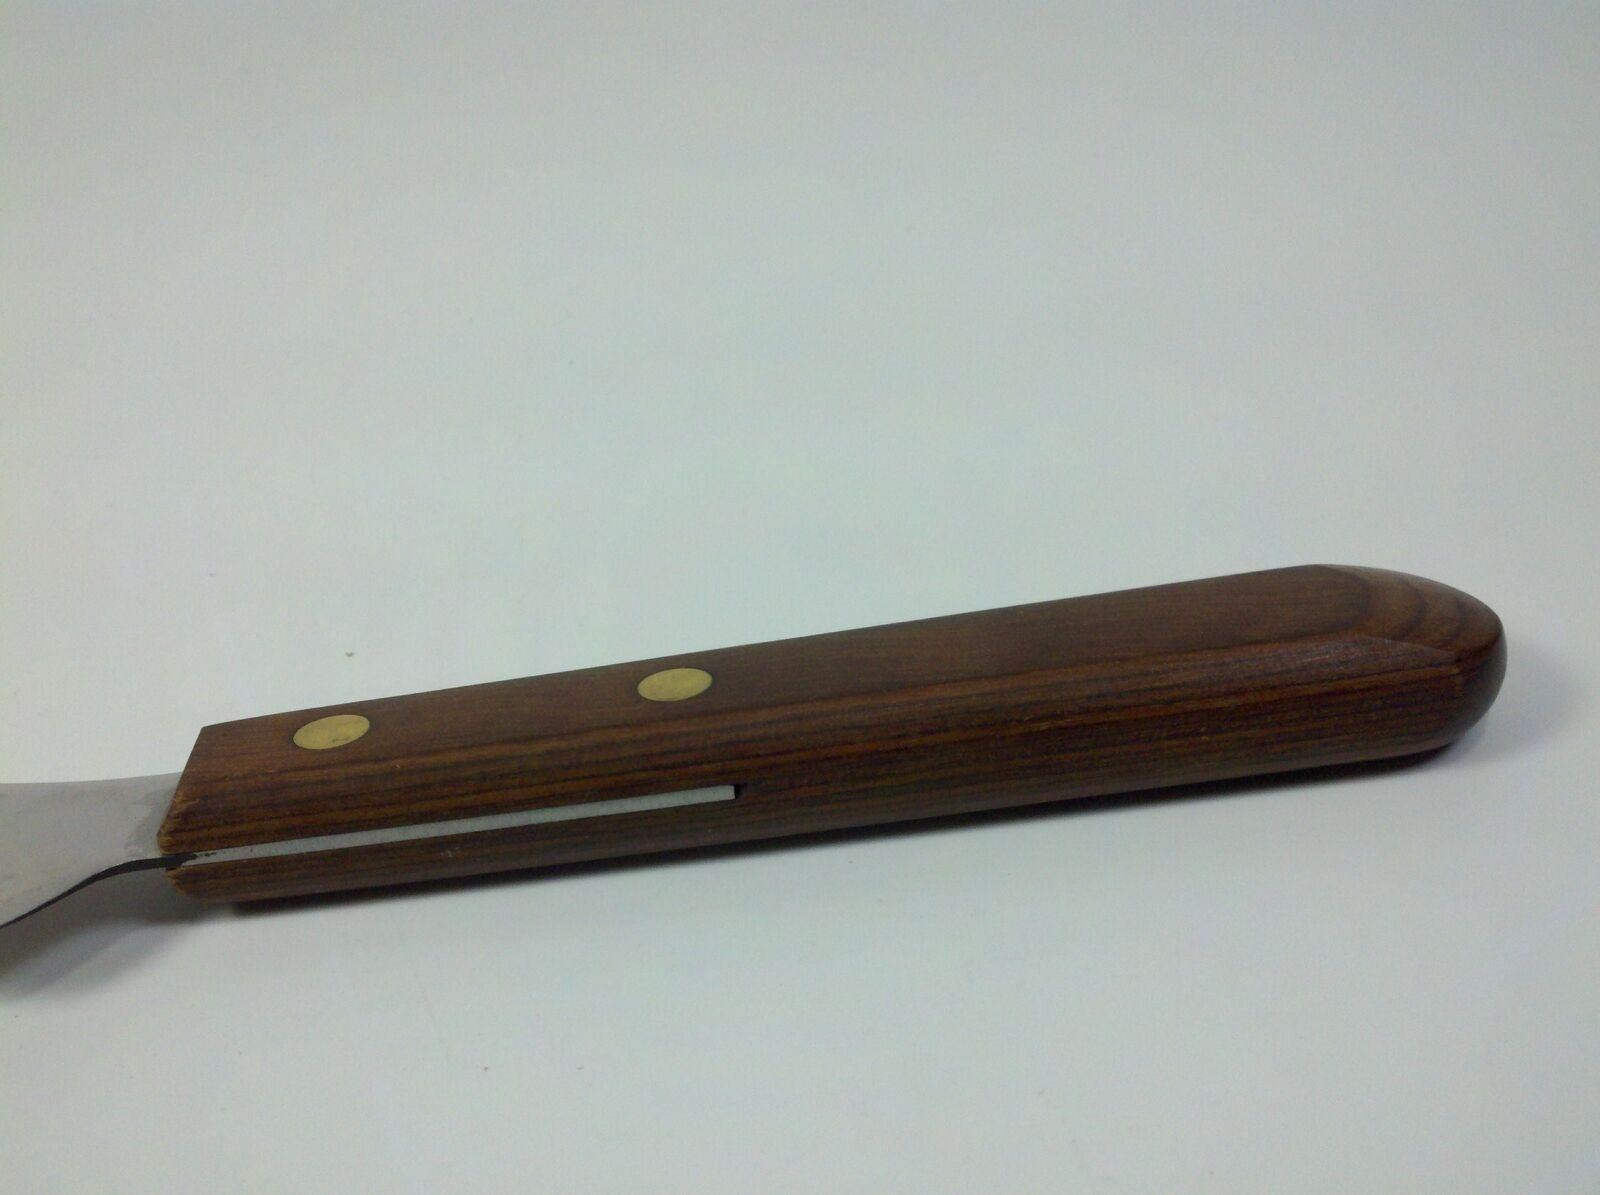 Ekco Viscount Stainless Steel Wooden Handheld Angled Knife